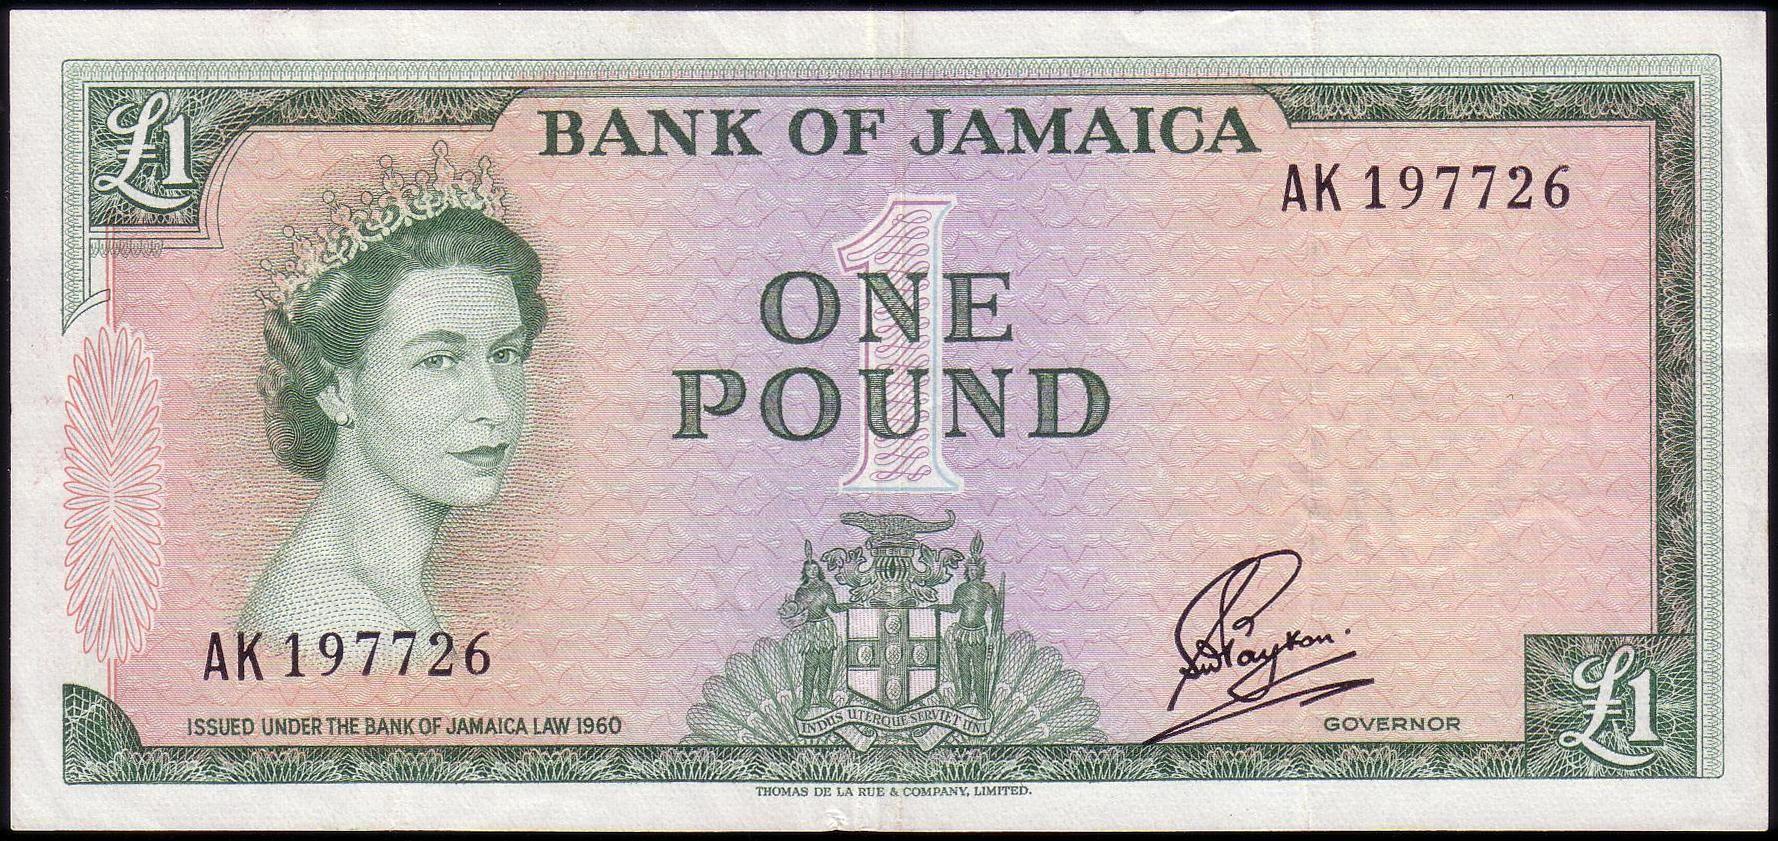 worksheet Jamaican Money jamaica money currency world pinterest currency